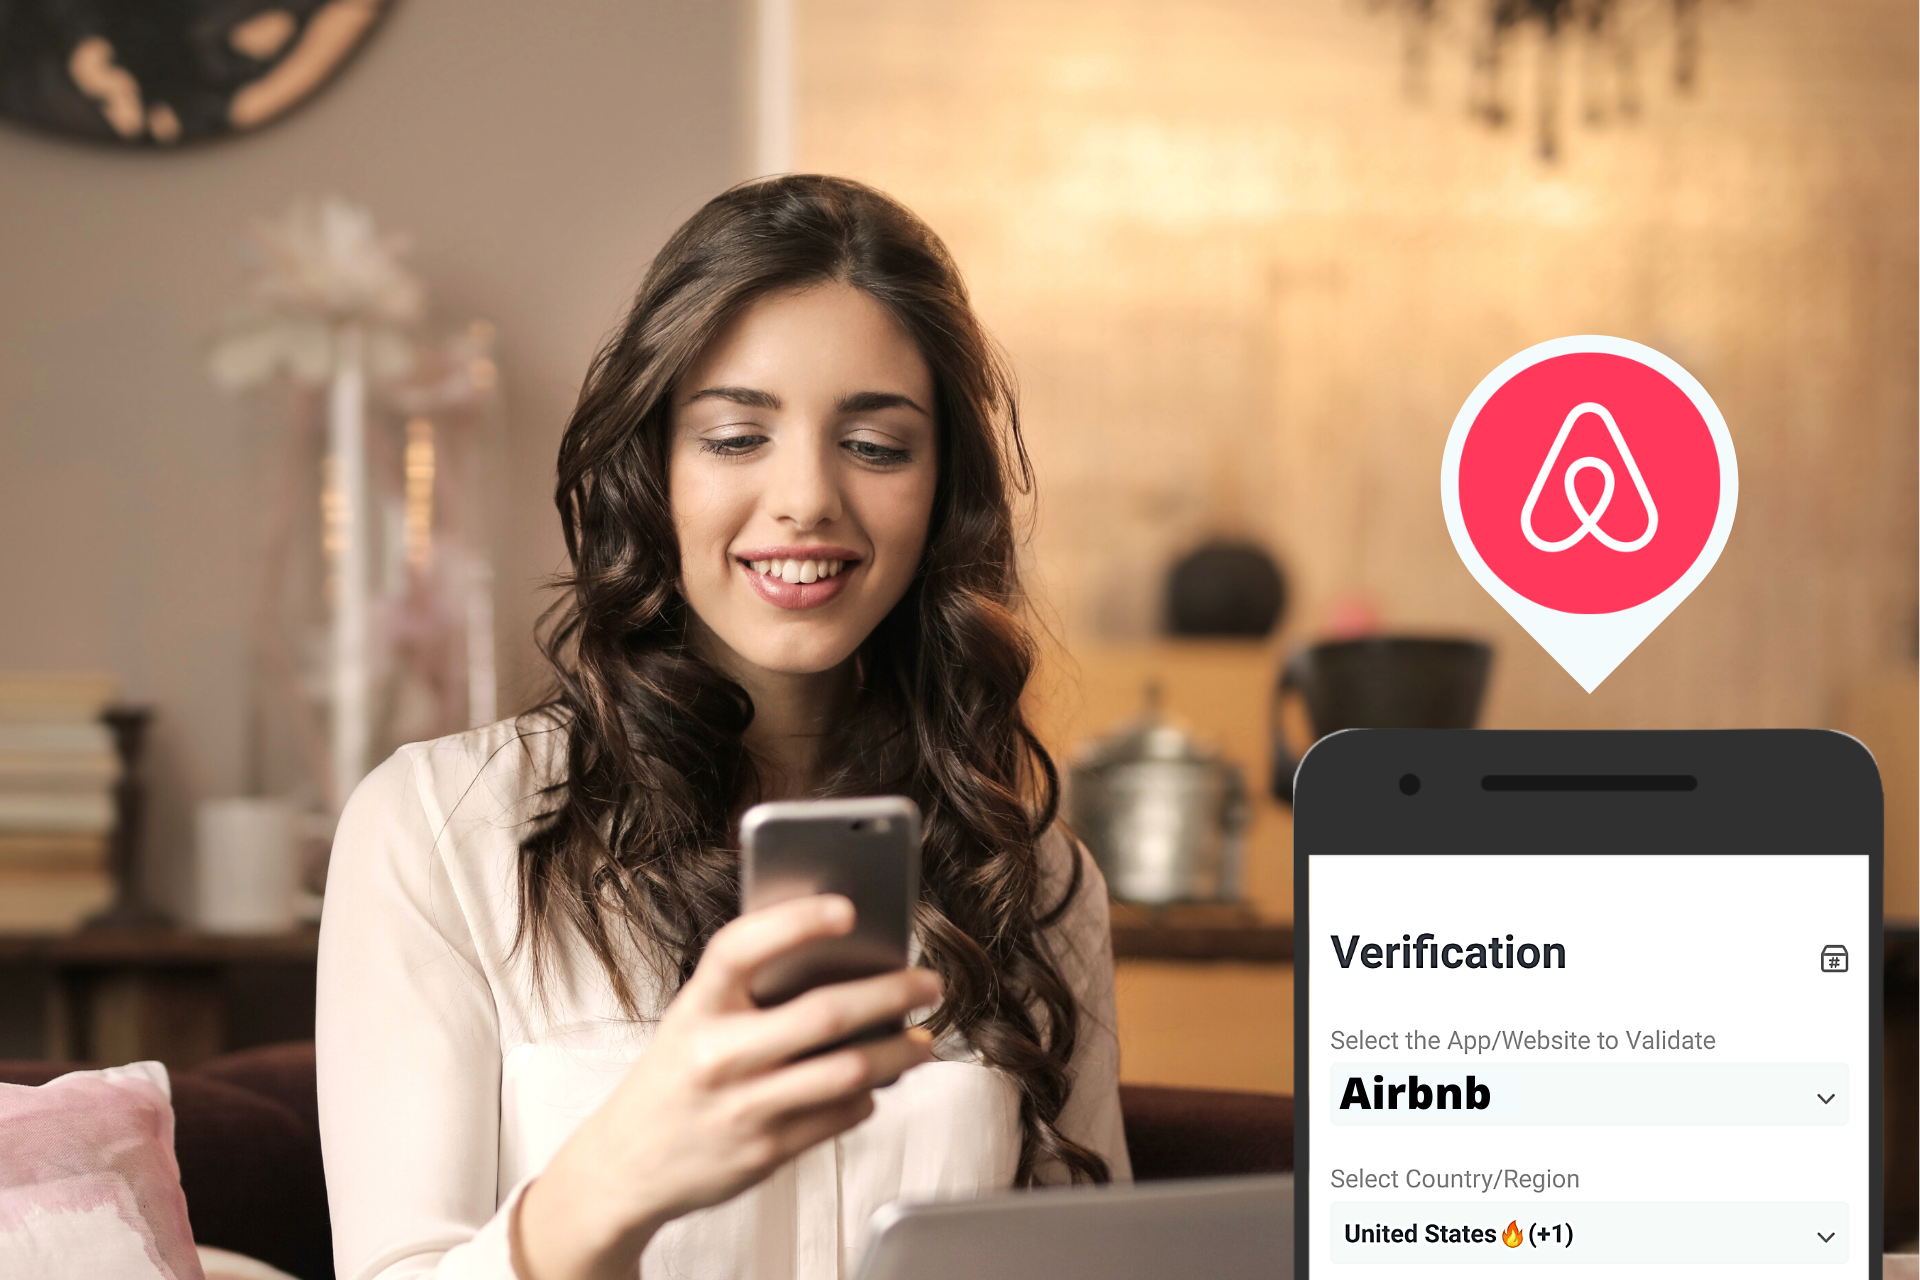 airbnb verification code